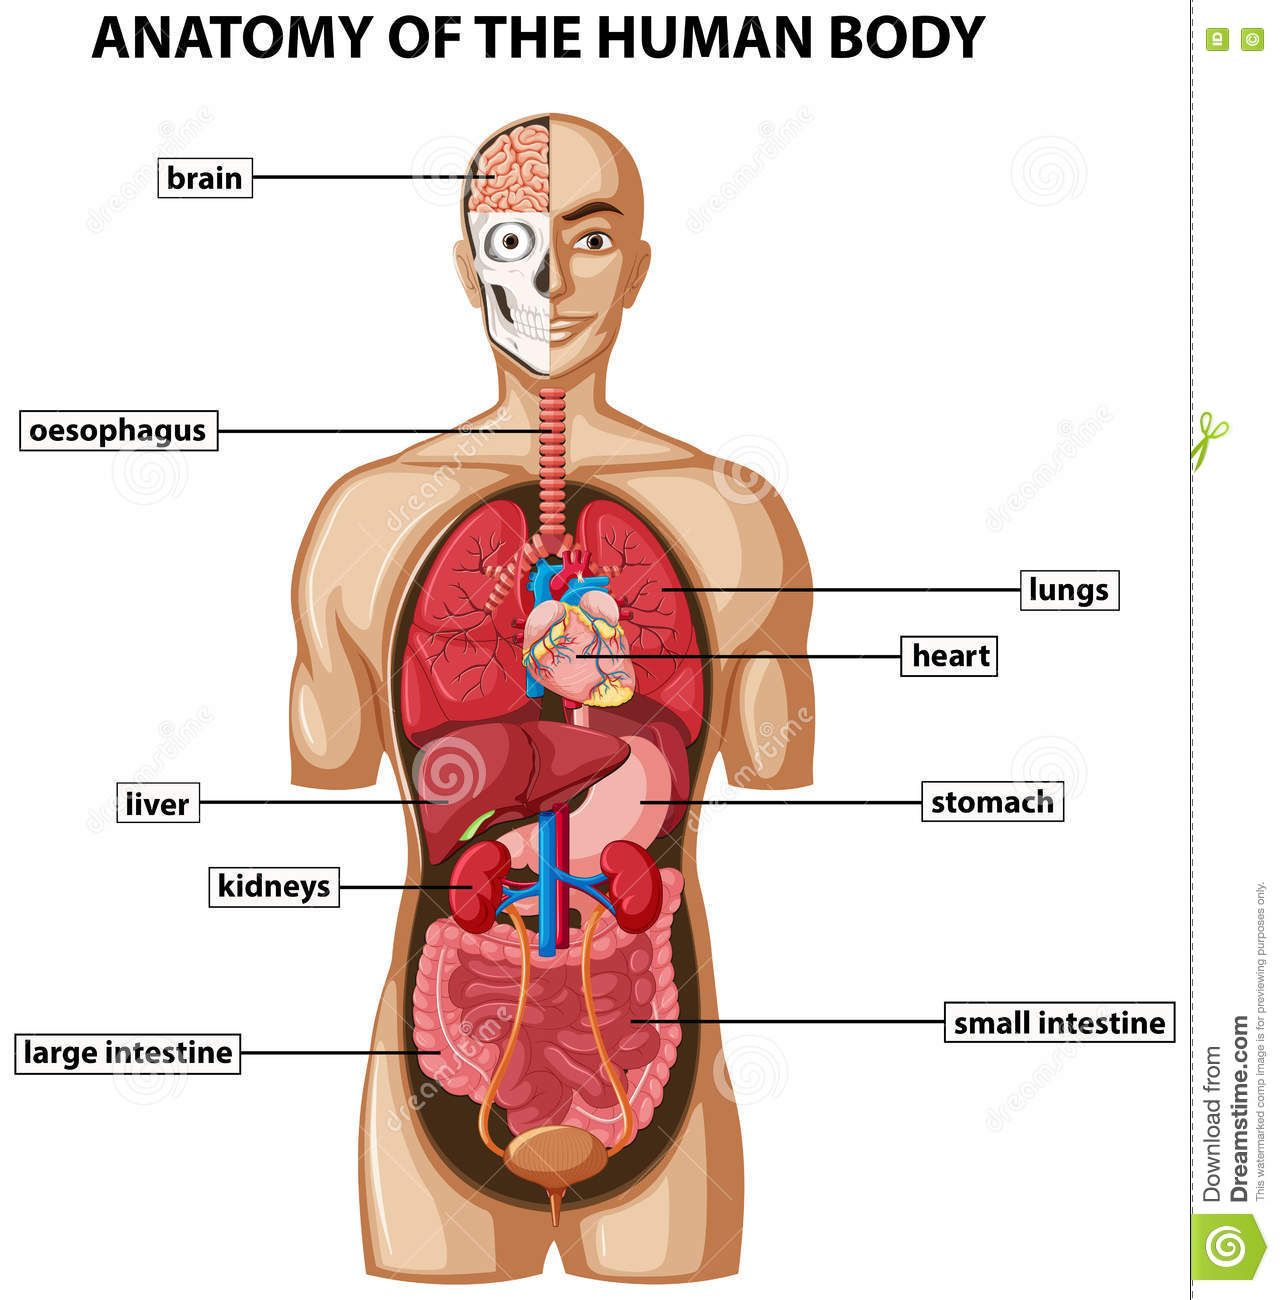 The Internal Organs Of The Human Body Human Anatomy Organs Human